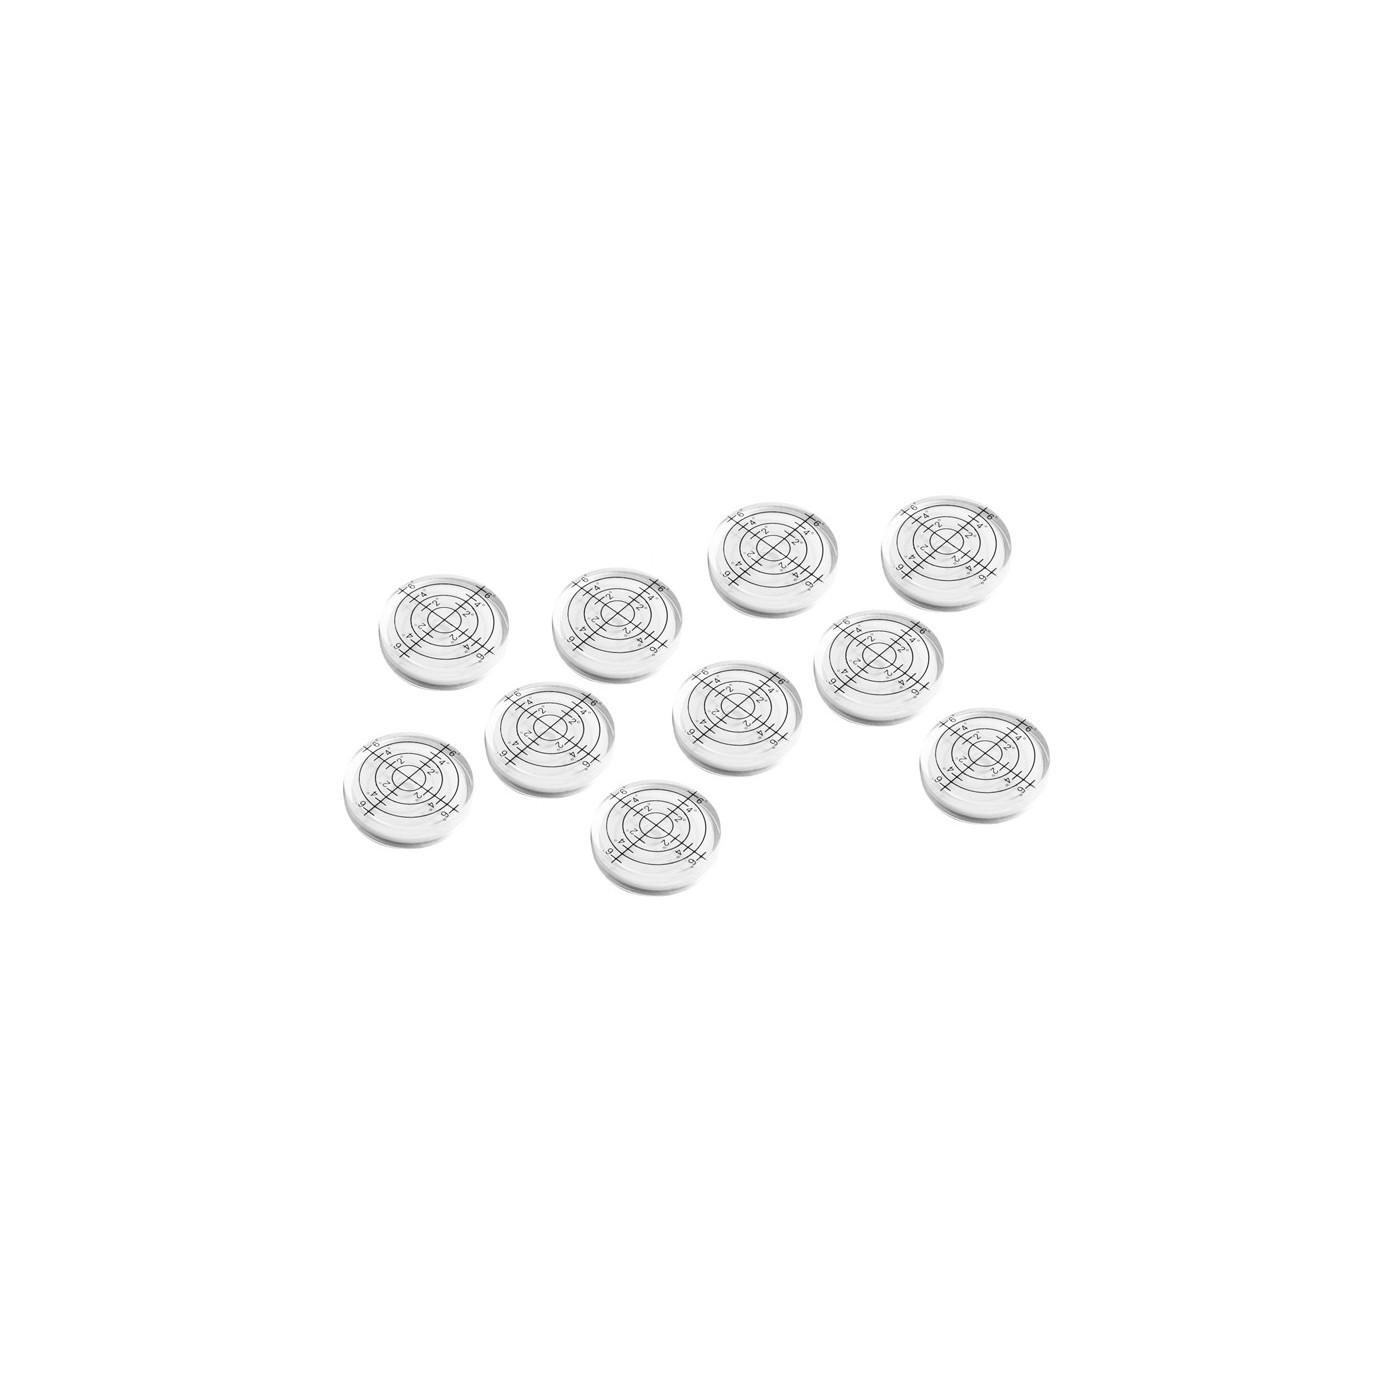 Conjunto de 10 frascos para injetáveis (32x7 mm, brancos)  - 1